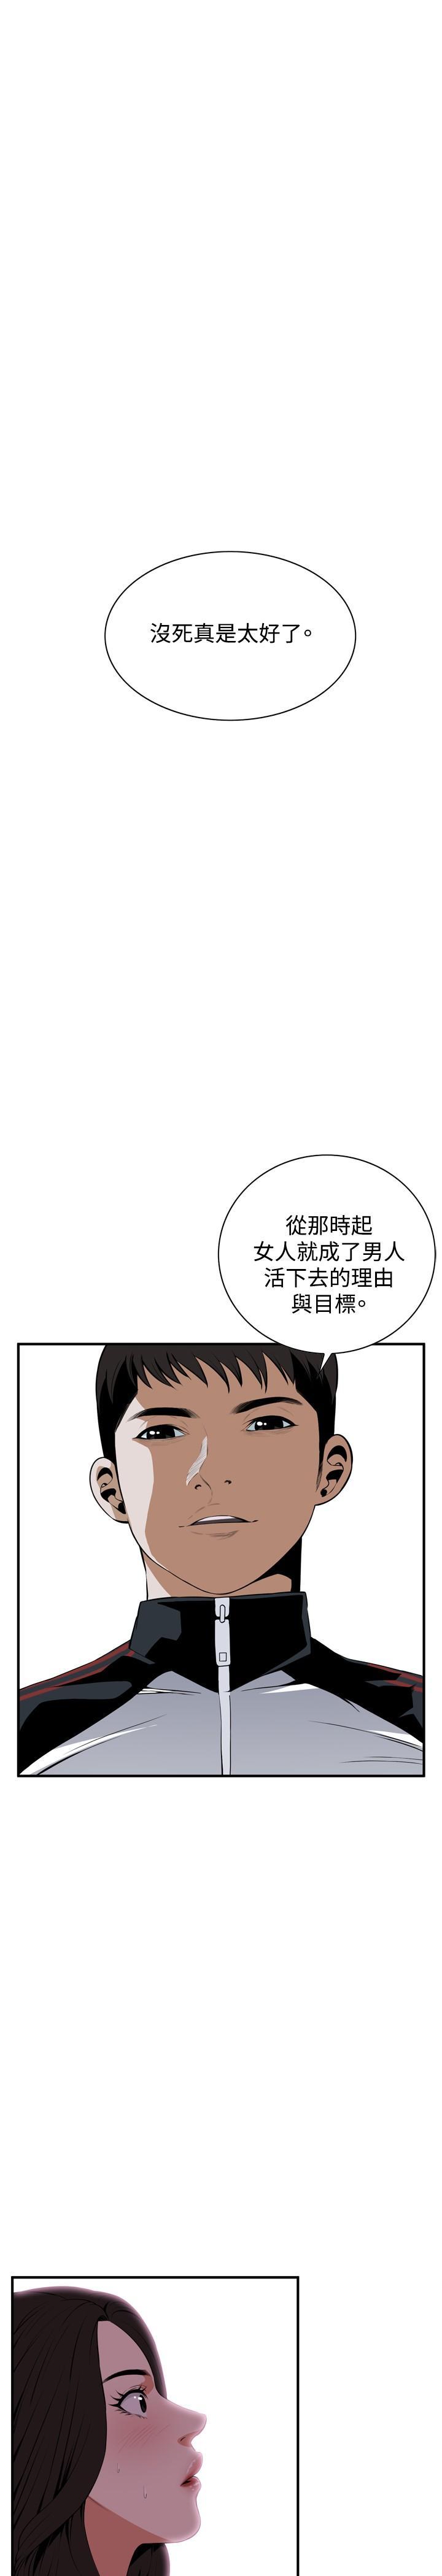 Take a Peek 偷窥 Ch.39~60 [Chinese]中文 42